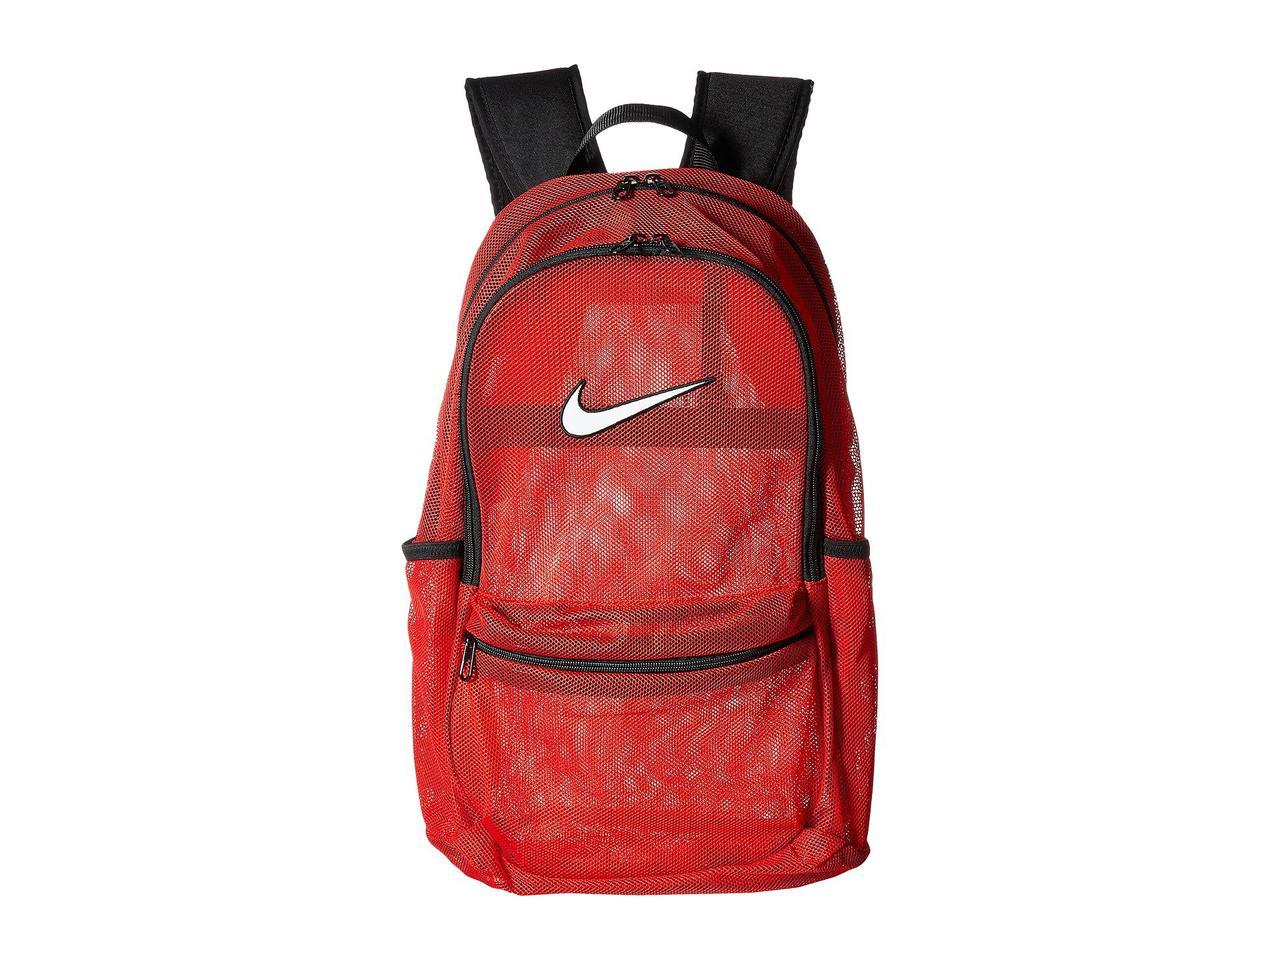 542779ecb3 Nike Brasilia 7 Large Mesh Backpack- Fenix Toulouse Handball